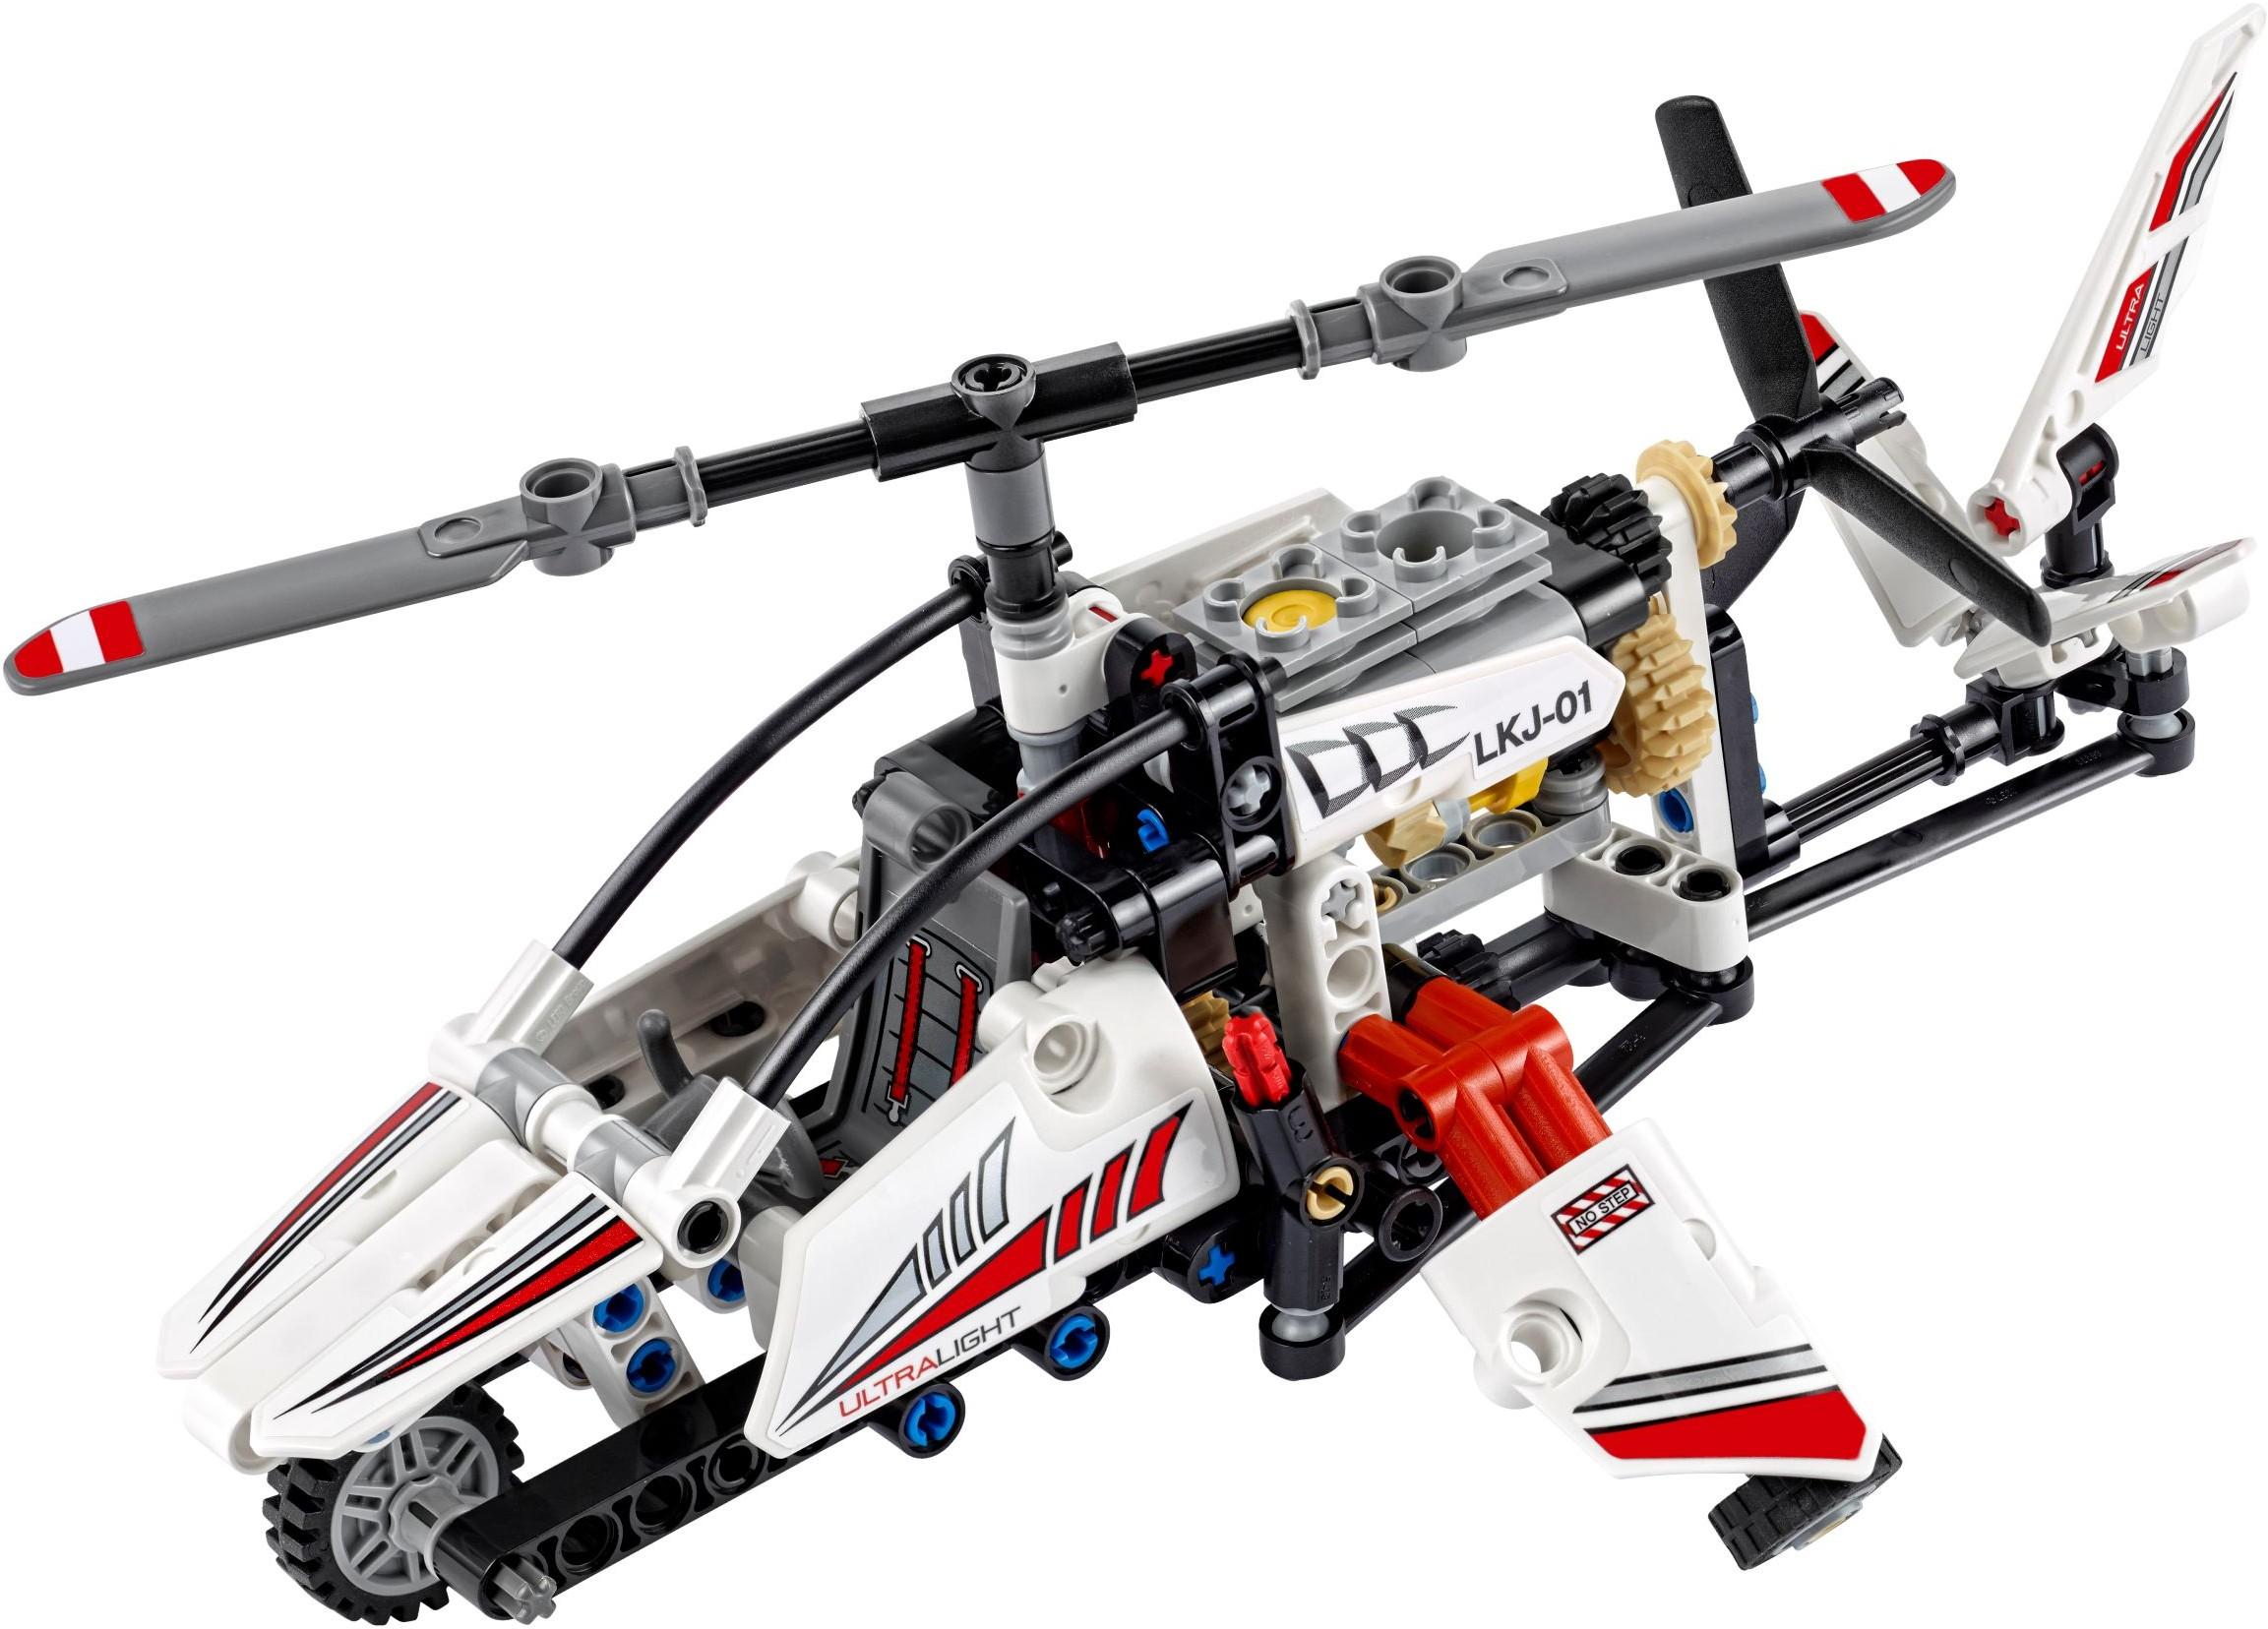 Mua đồ chơi LEGO 42057 - LEGO Technic 42057 - Trực Thăng Biểu Diễn (LEGO Technic Ultralight Helicopter 42057)